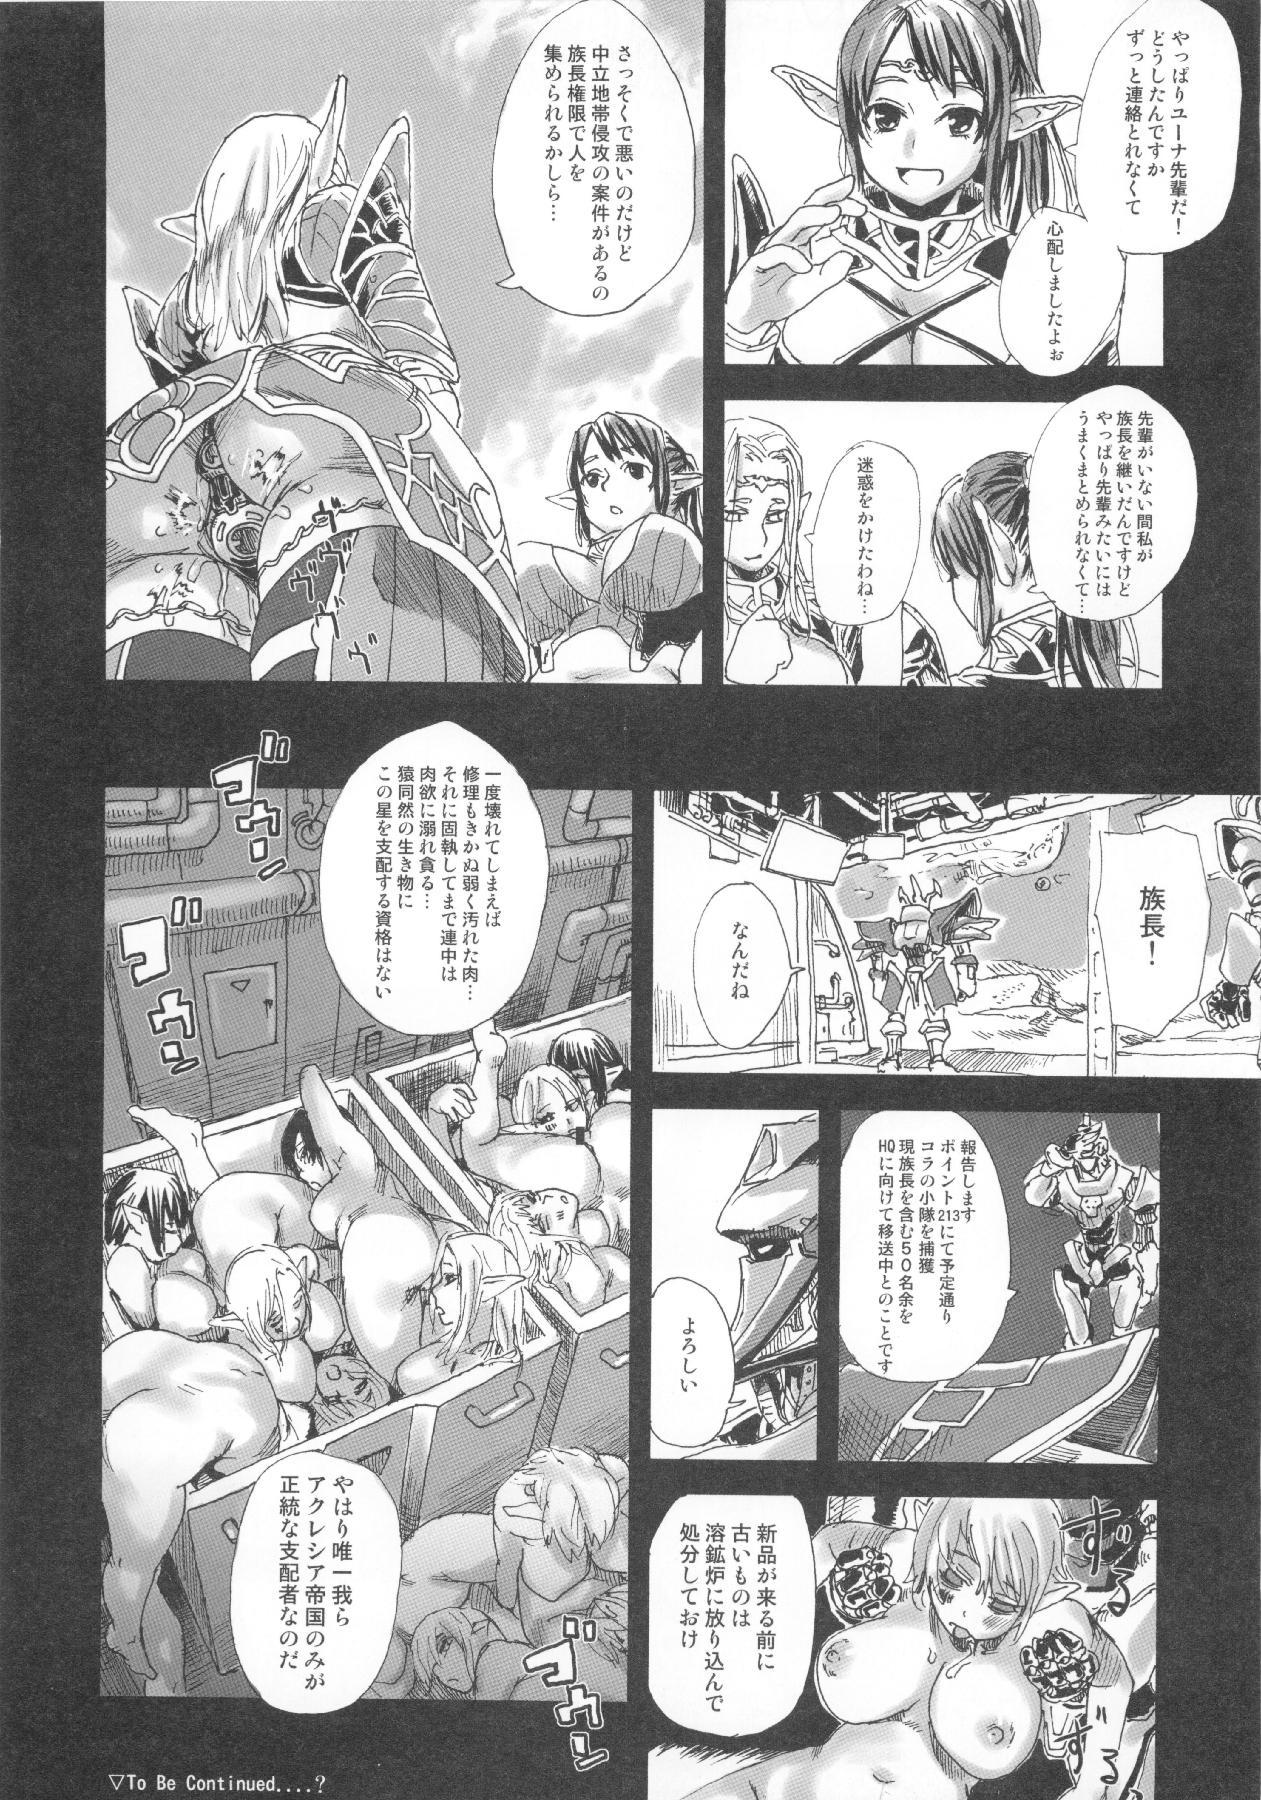 (C83) [Fatalpulse (Asanagi)] VictimGirls Compiled Vol.1 -Victimgirls Soushuuhen 1- MMO Game Selection (Various) 112